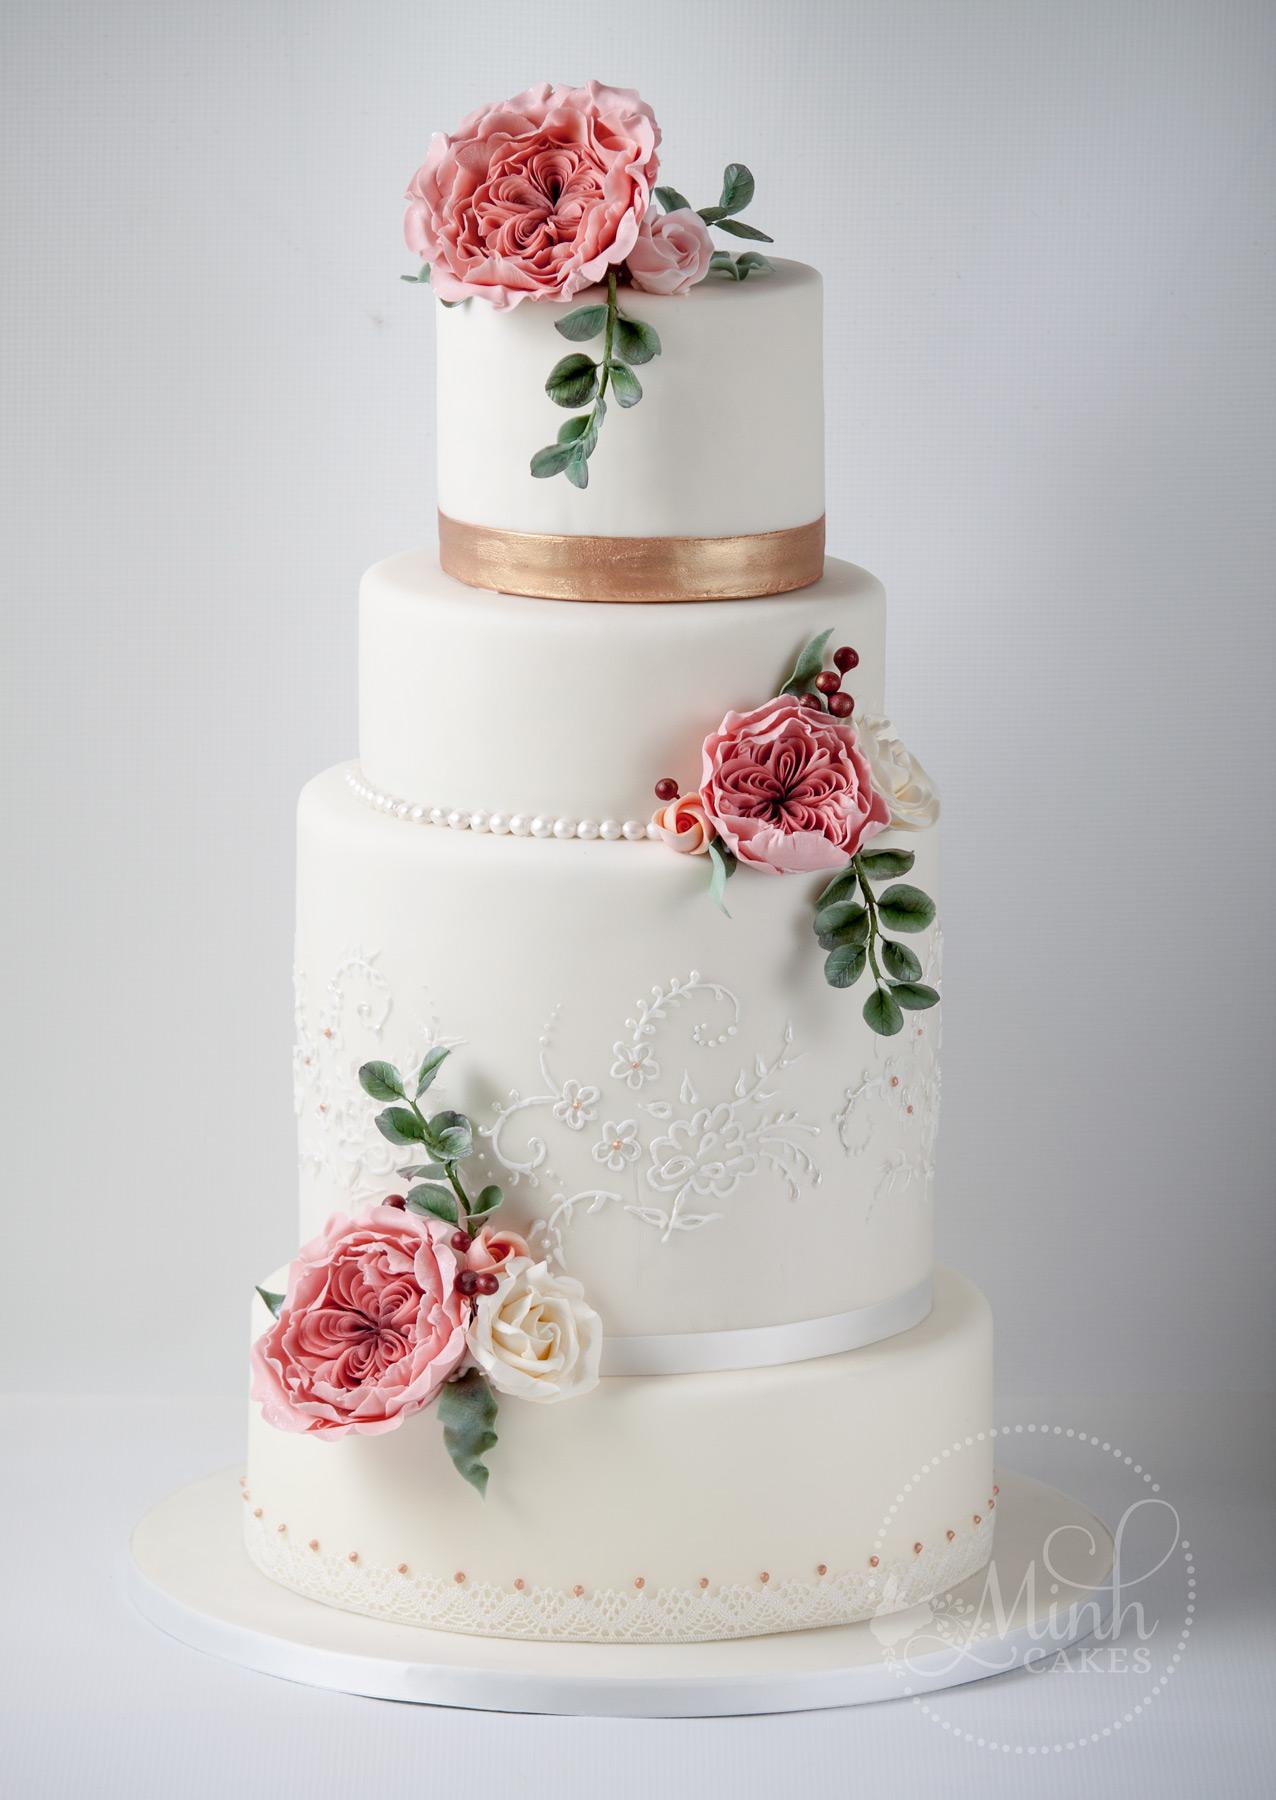 Surprising Austin Wedding Cakes Pictures Decors Dievoon - Austin Wedding Cake